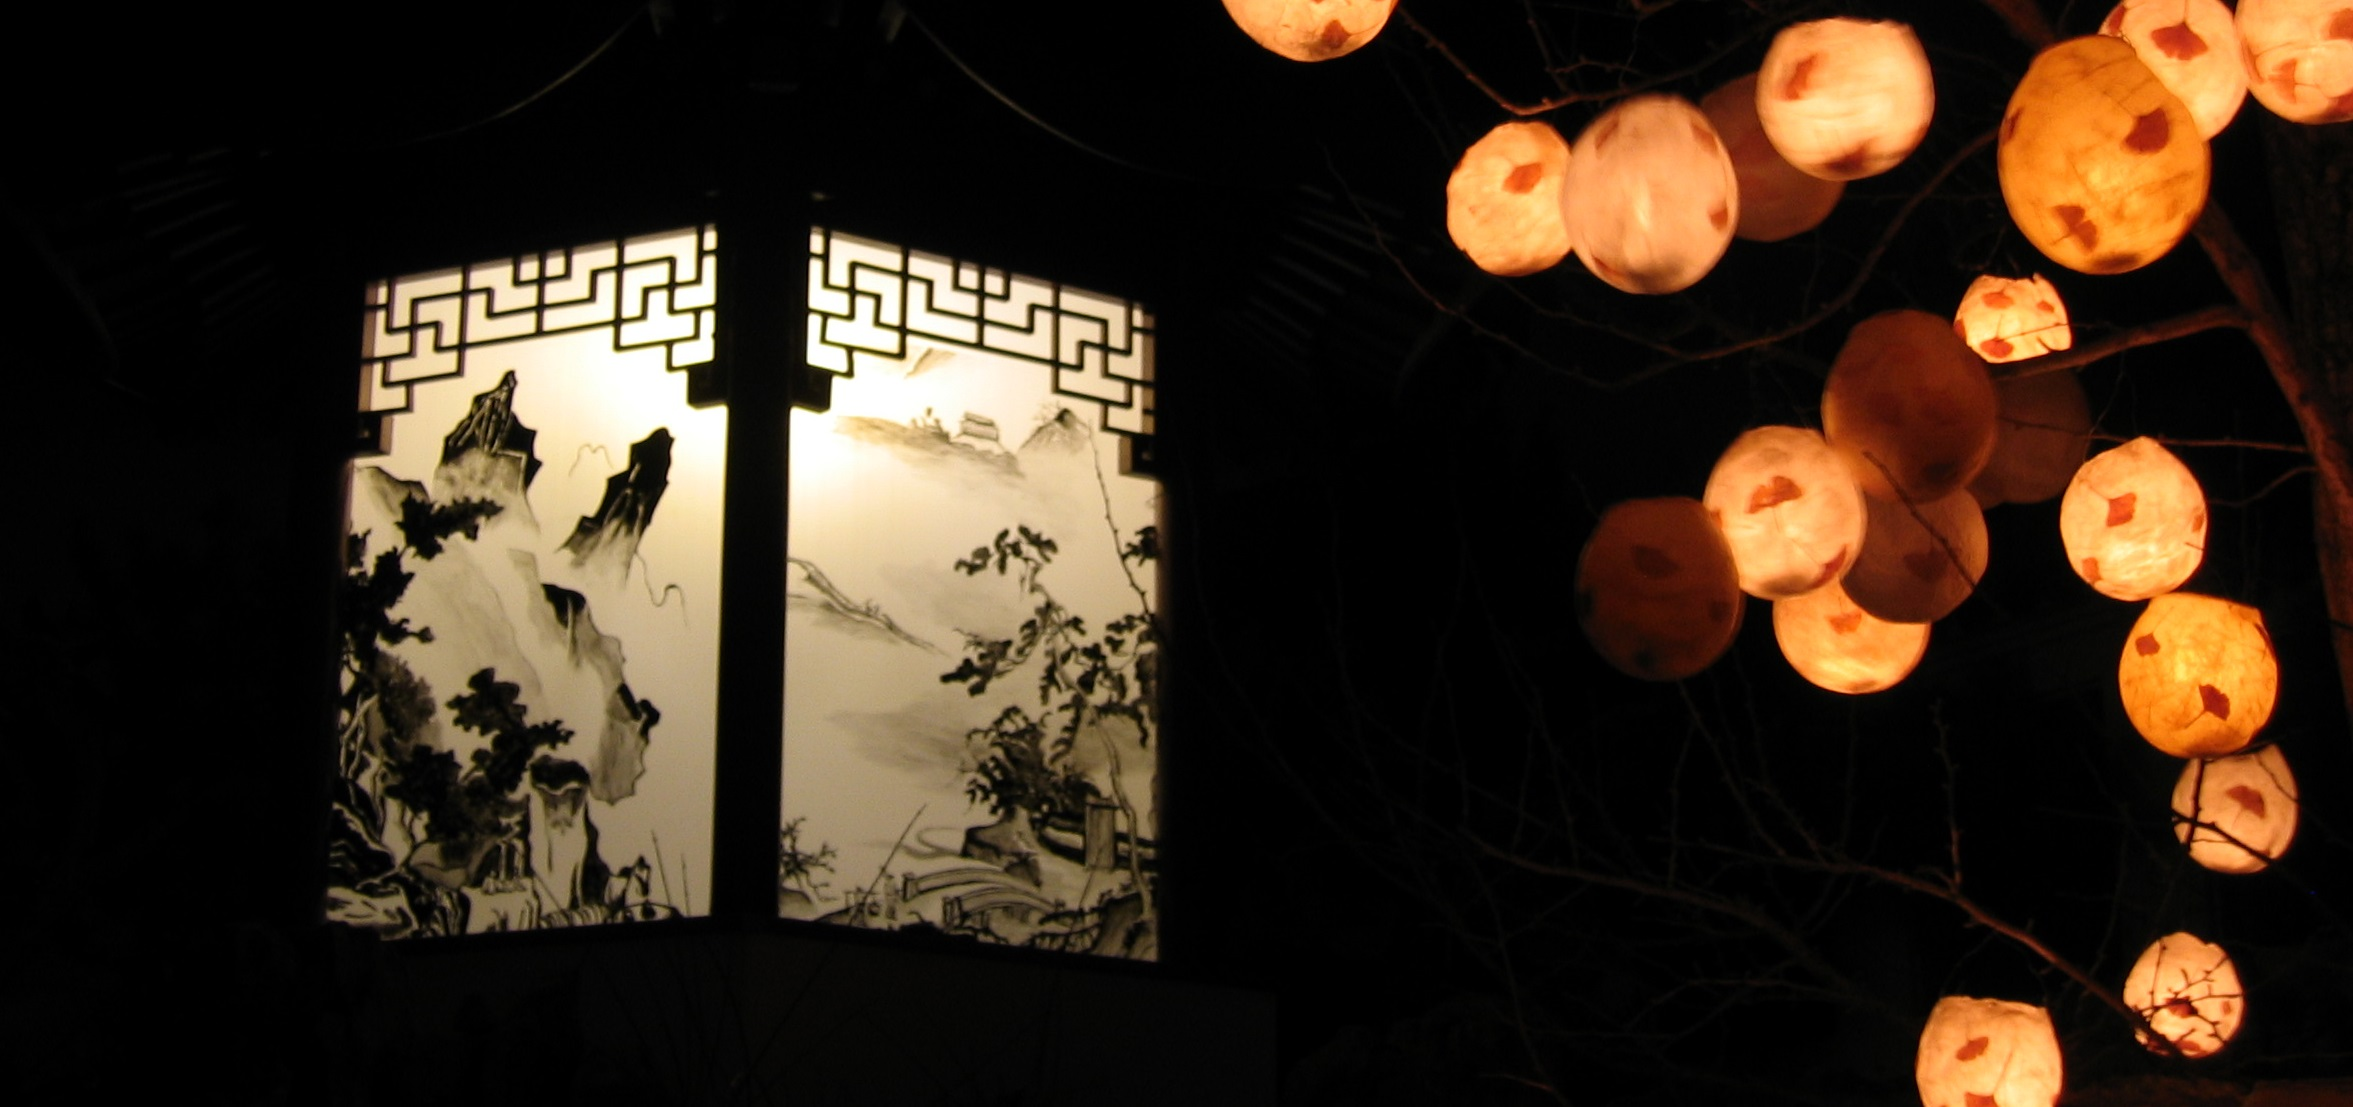 Sun Yat Sen lights rsz